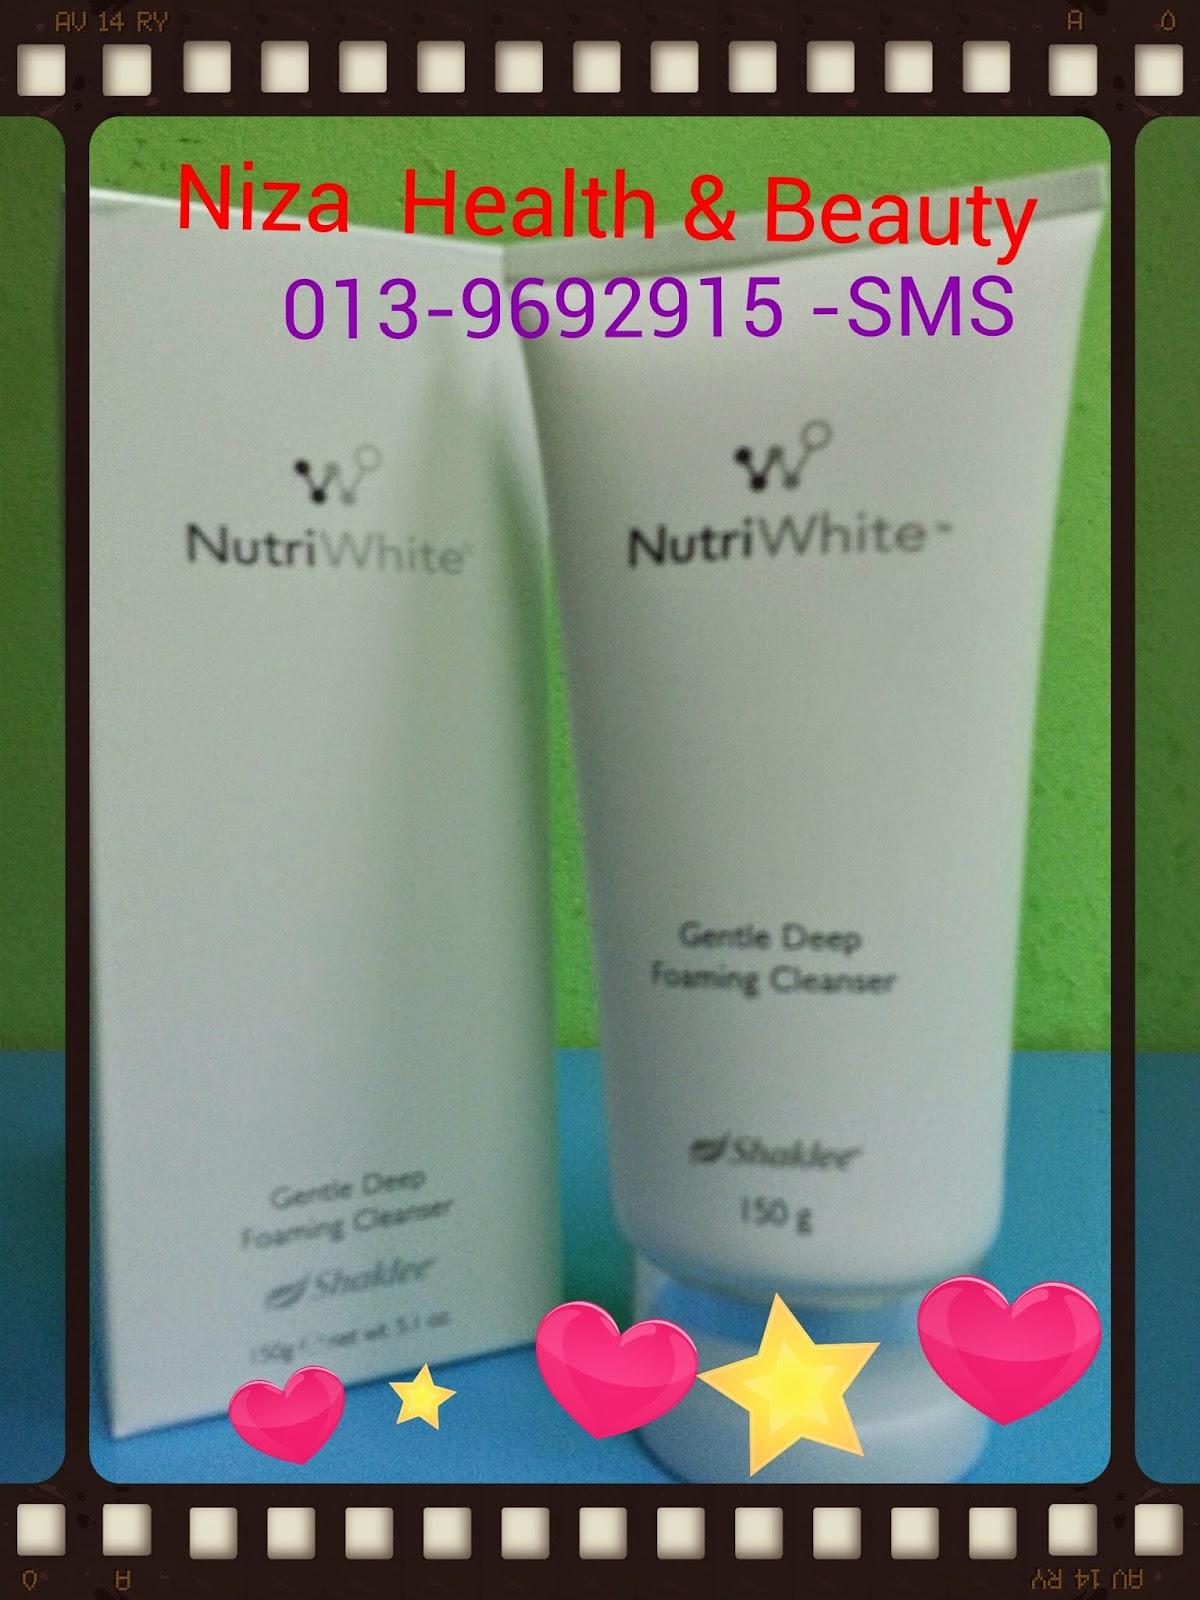 Nutriwhite Facial Cleanser Shaklee